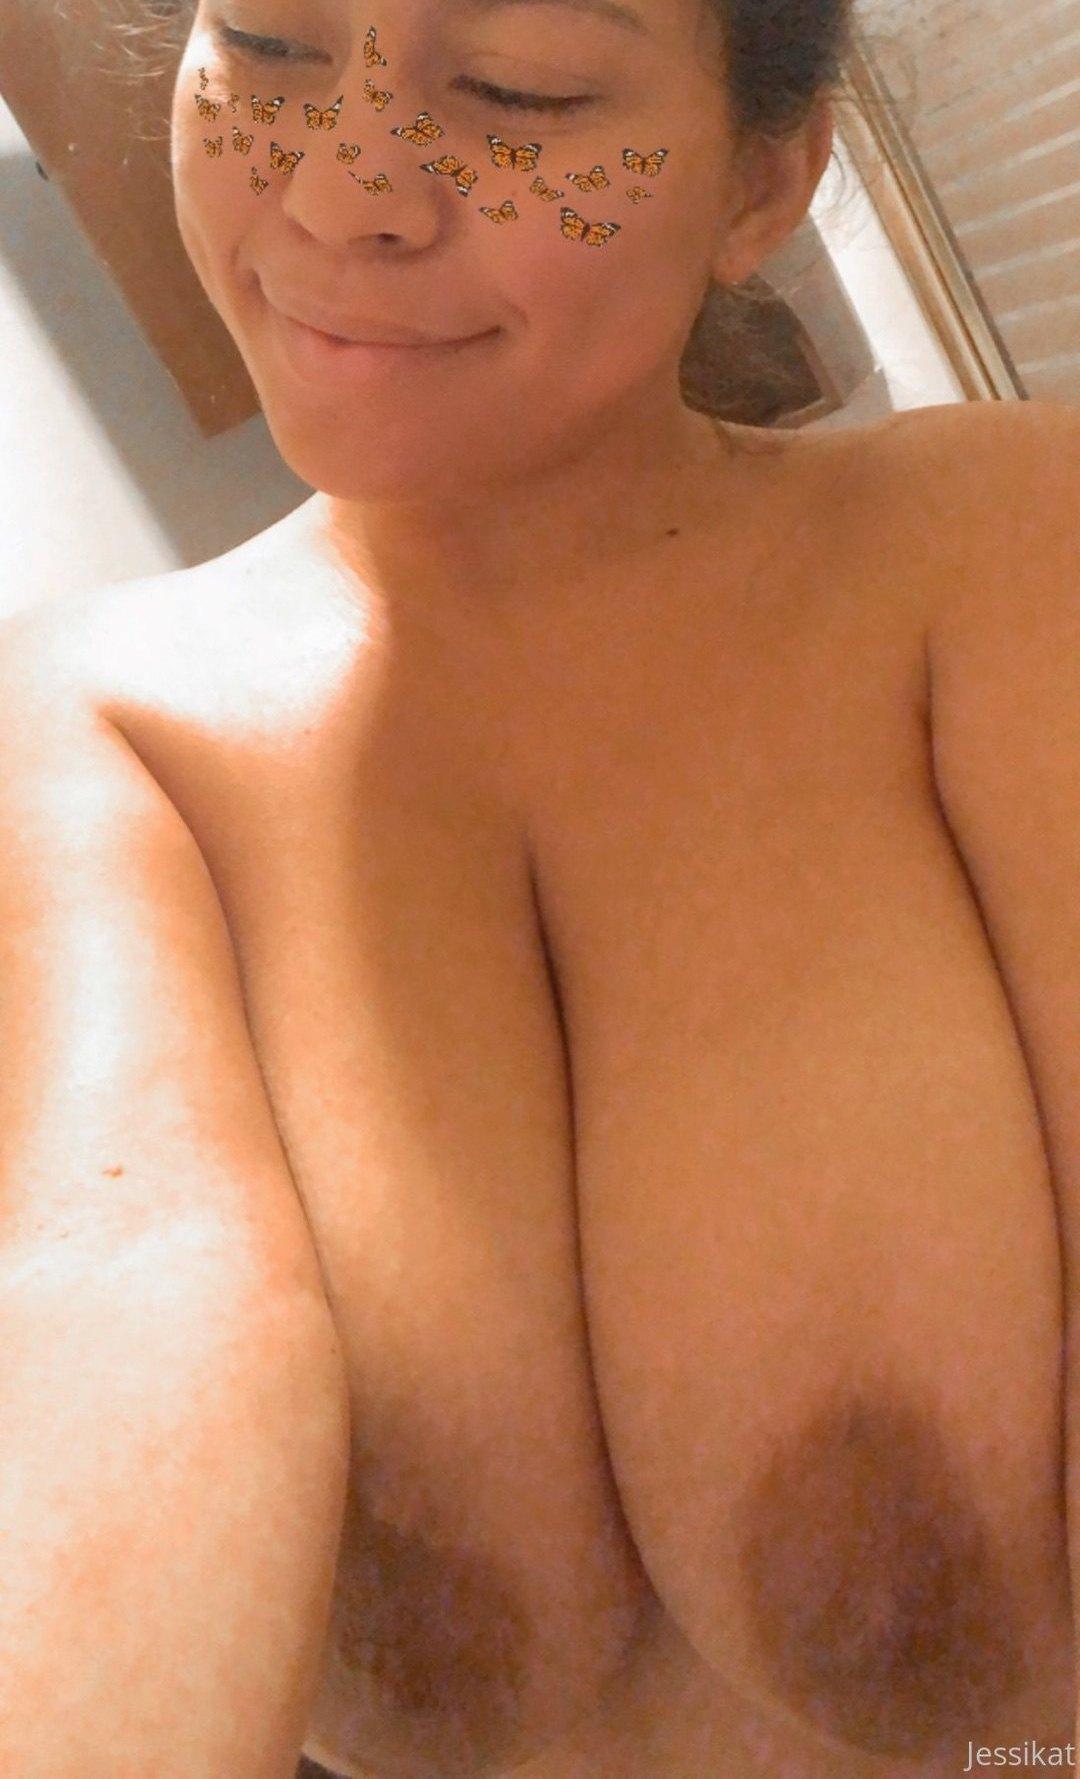 Jesselle Jessikat Onlyfans Nudes Leaks 0024